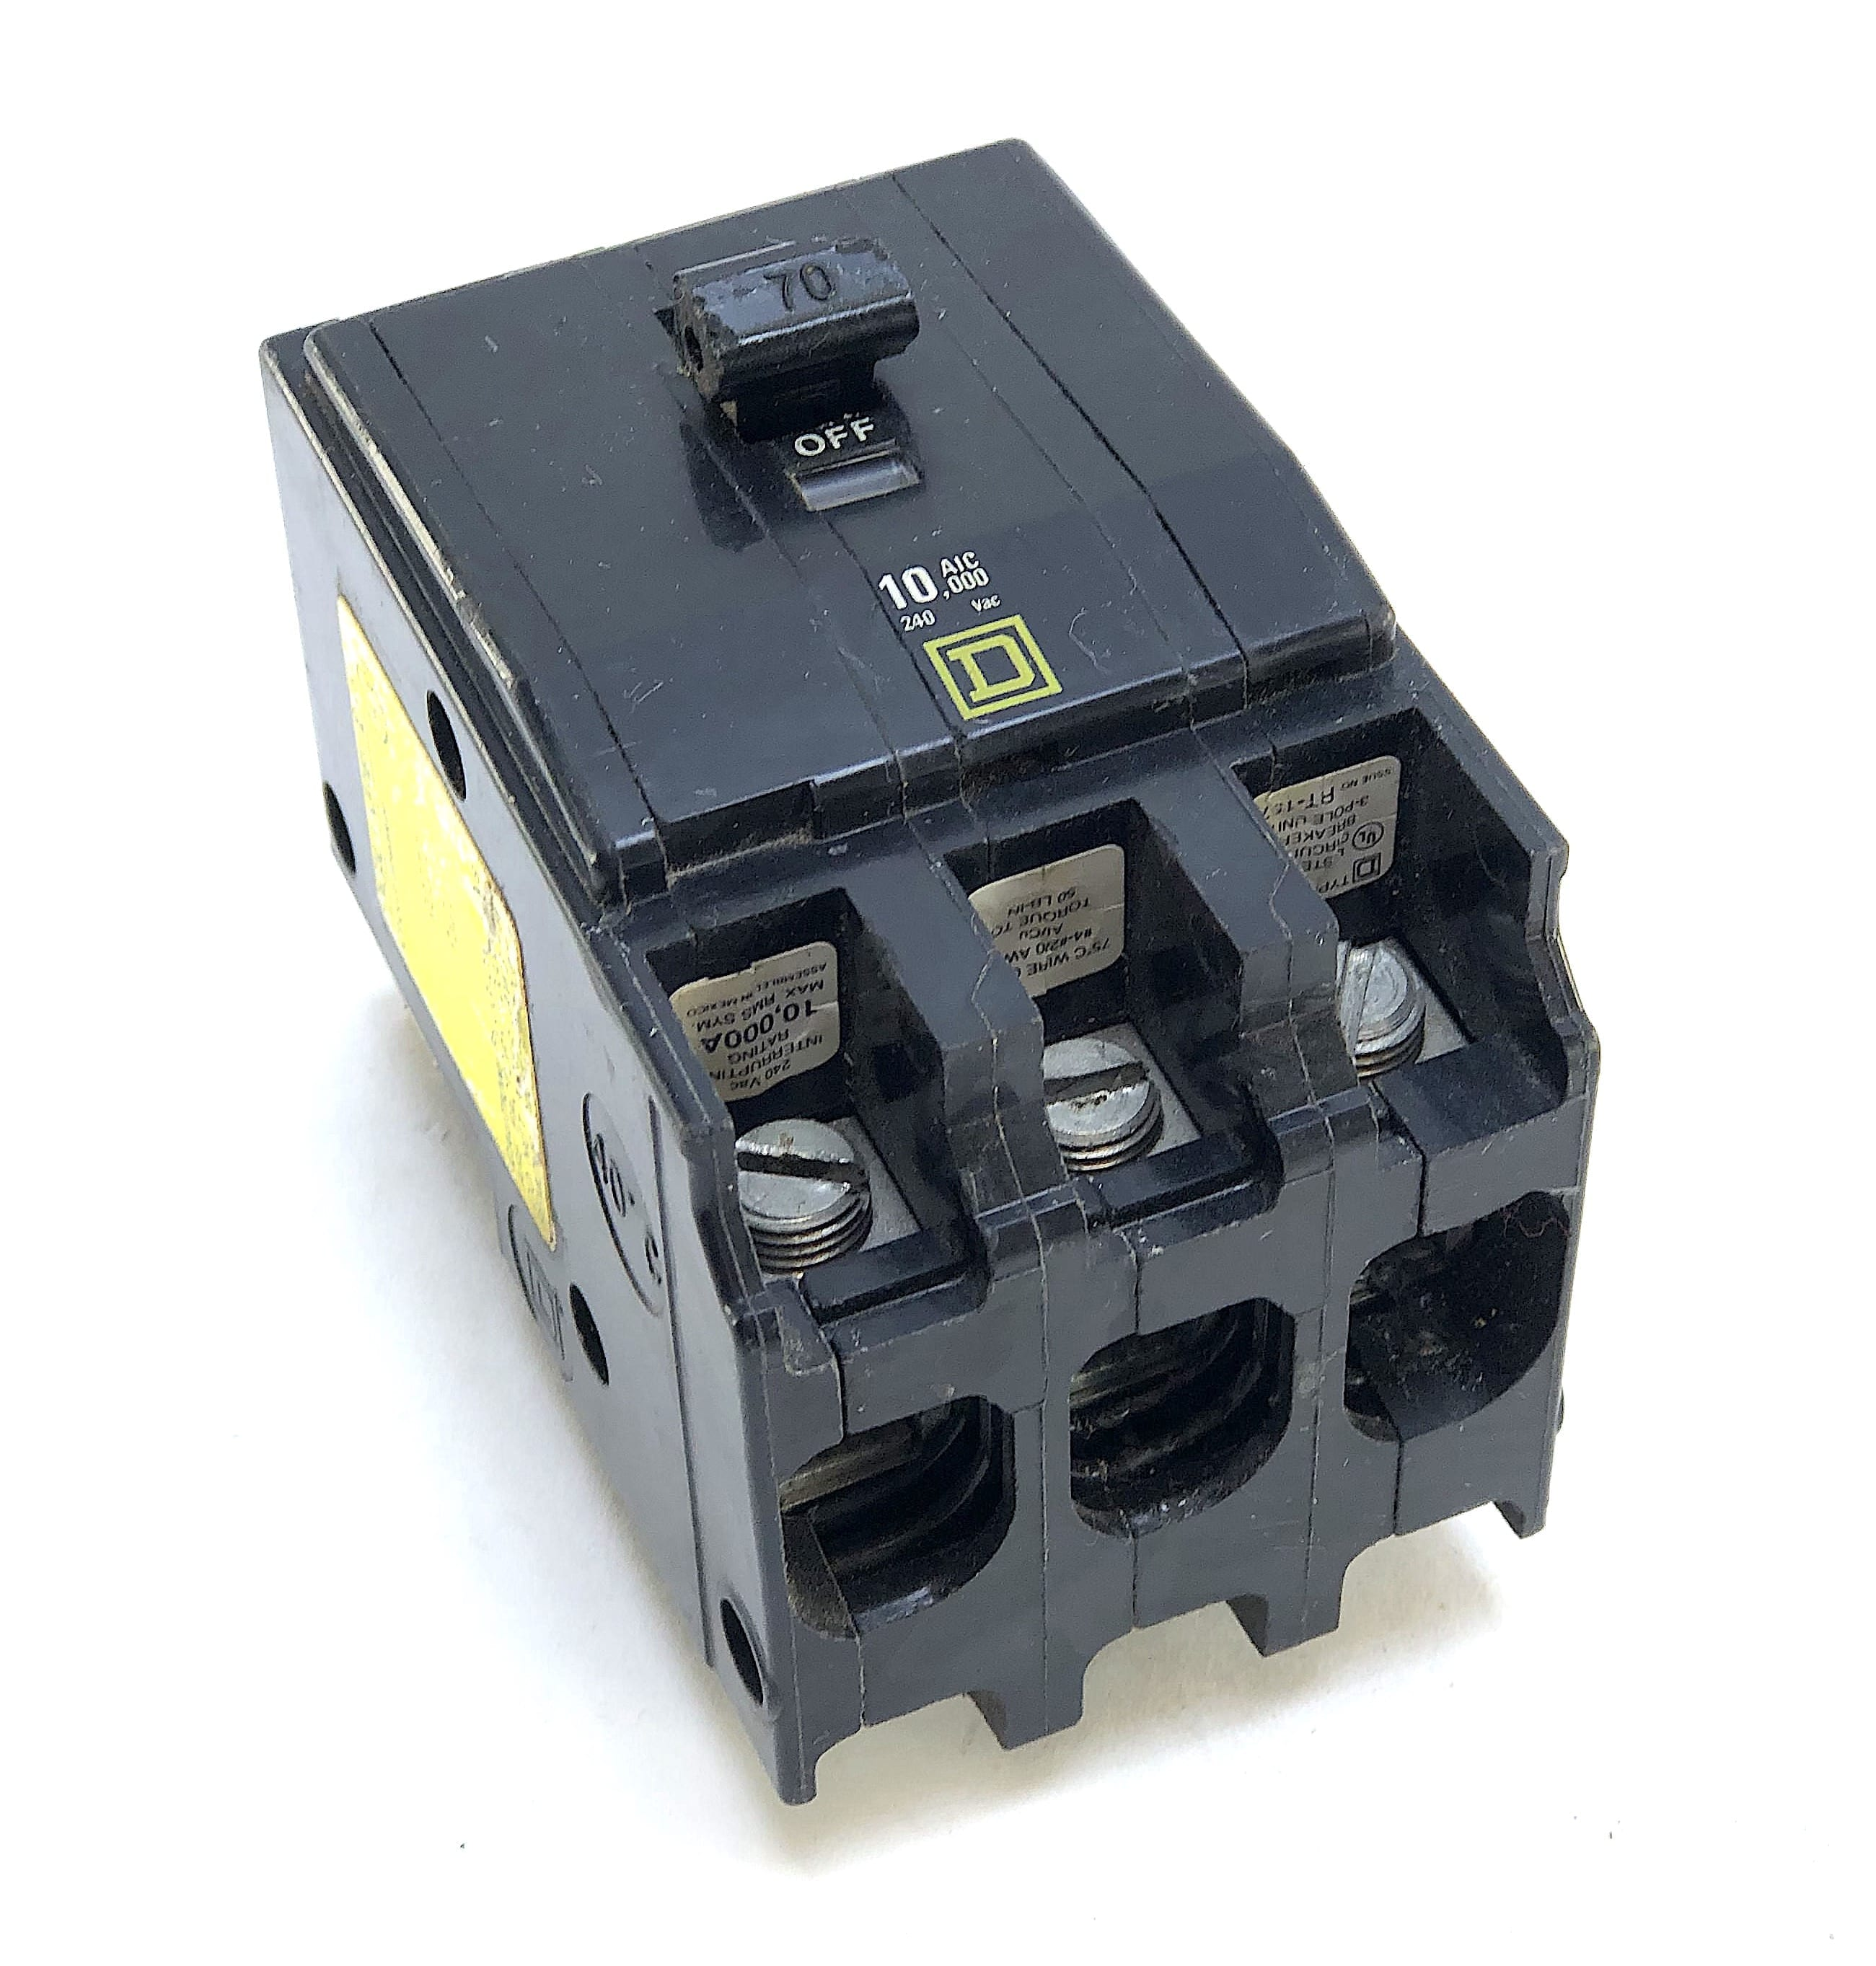 QO370 Square D Circuit Breaker 3-Pole 70 Amp